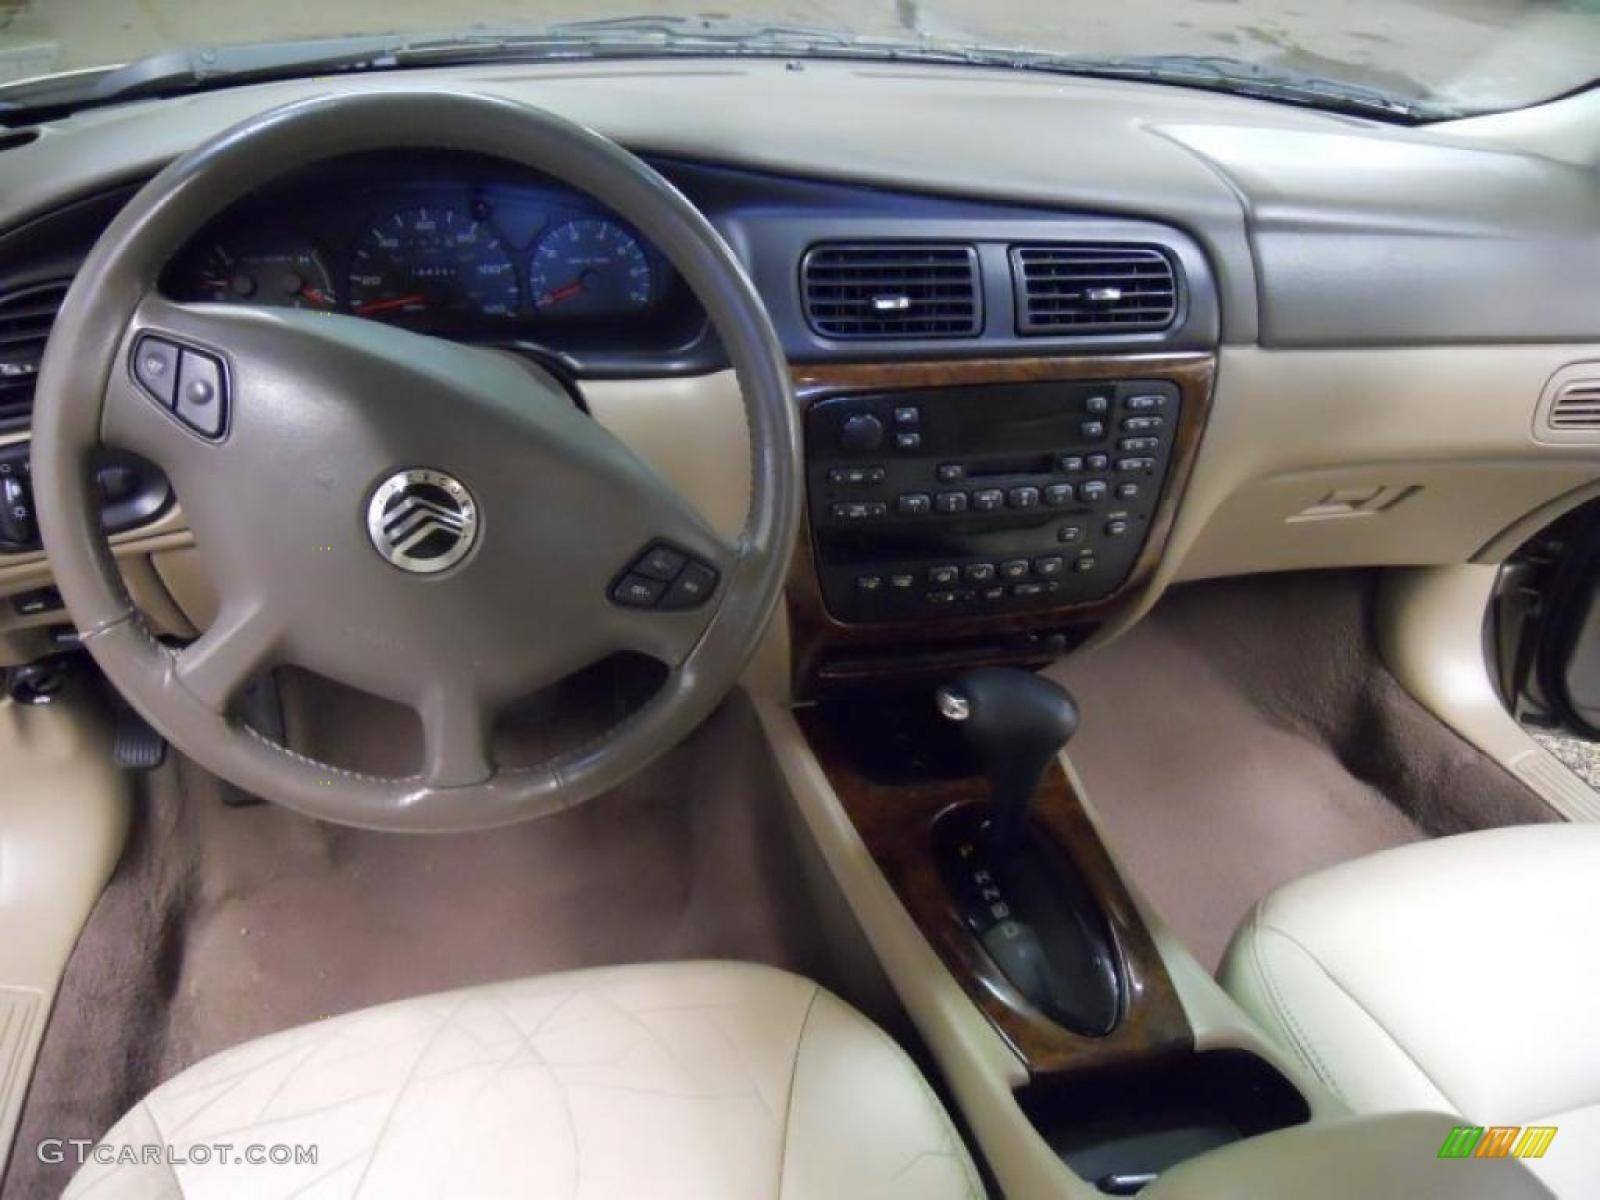 2002 Mercury Sable Information And Photos Zombiedrive 1998 Subaru Outback Interior 800 1024 1280 1600 Origin